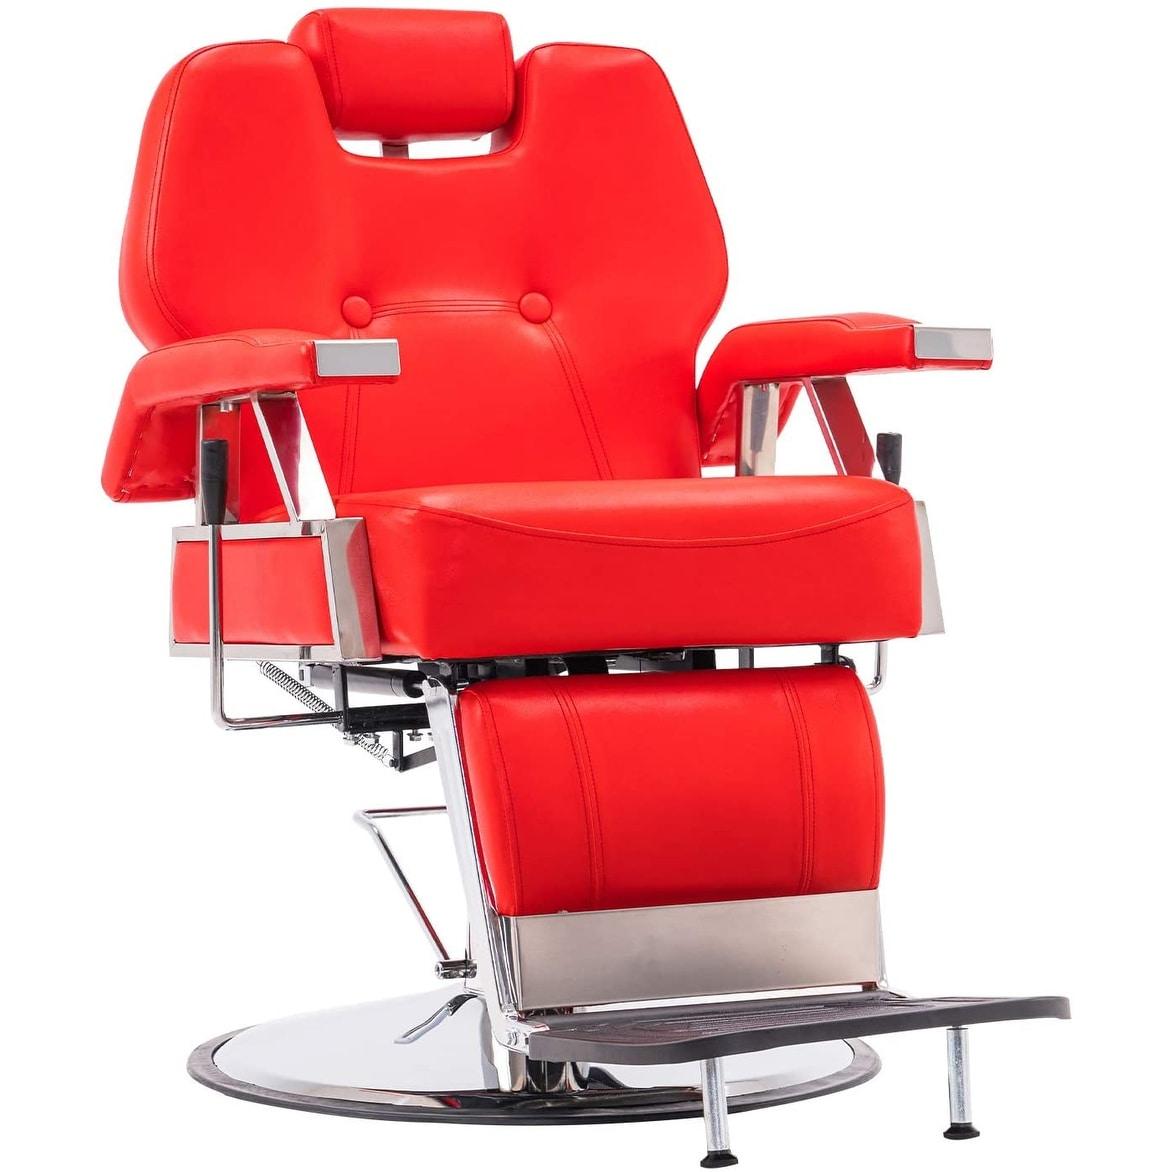 Thumbnail 9, BarberPub All Purpose Hydraulic Recline Barber Chair. Changes active main hero.